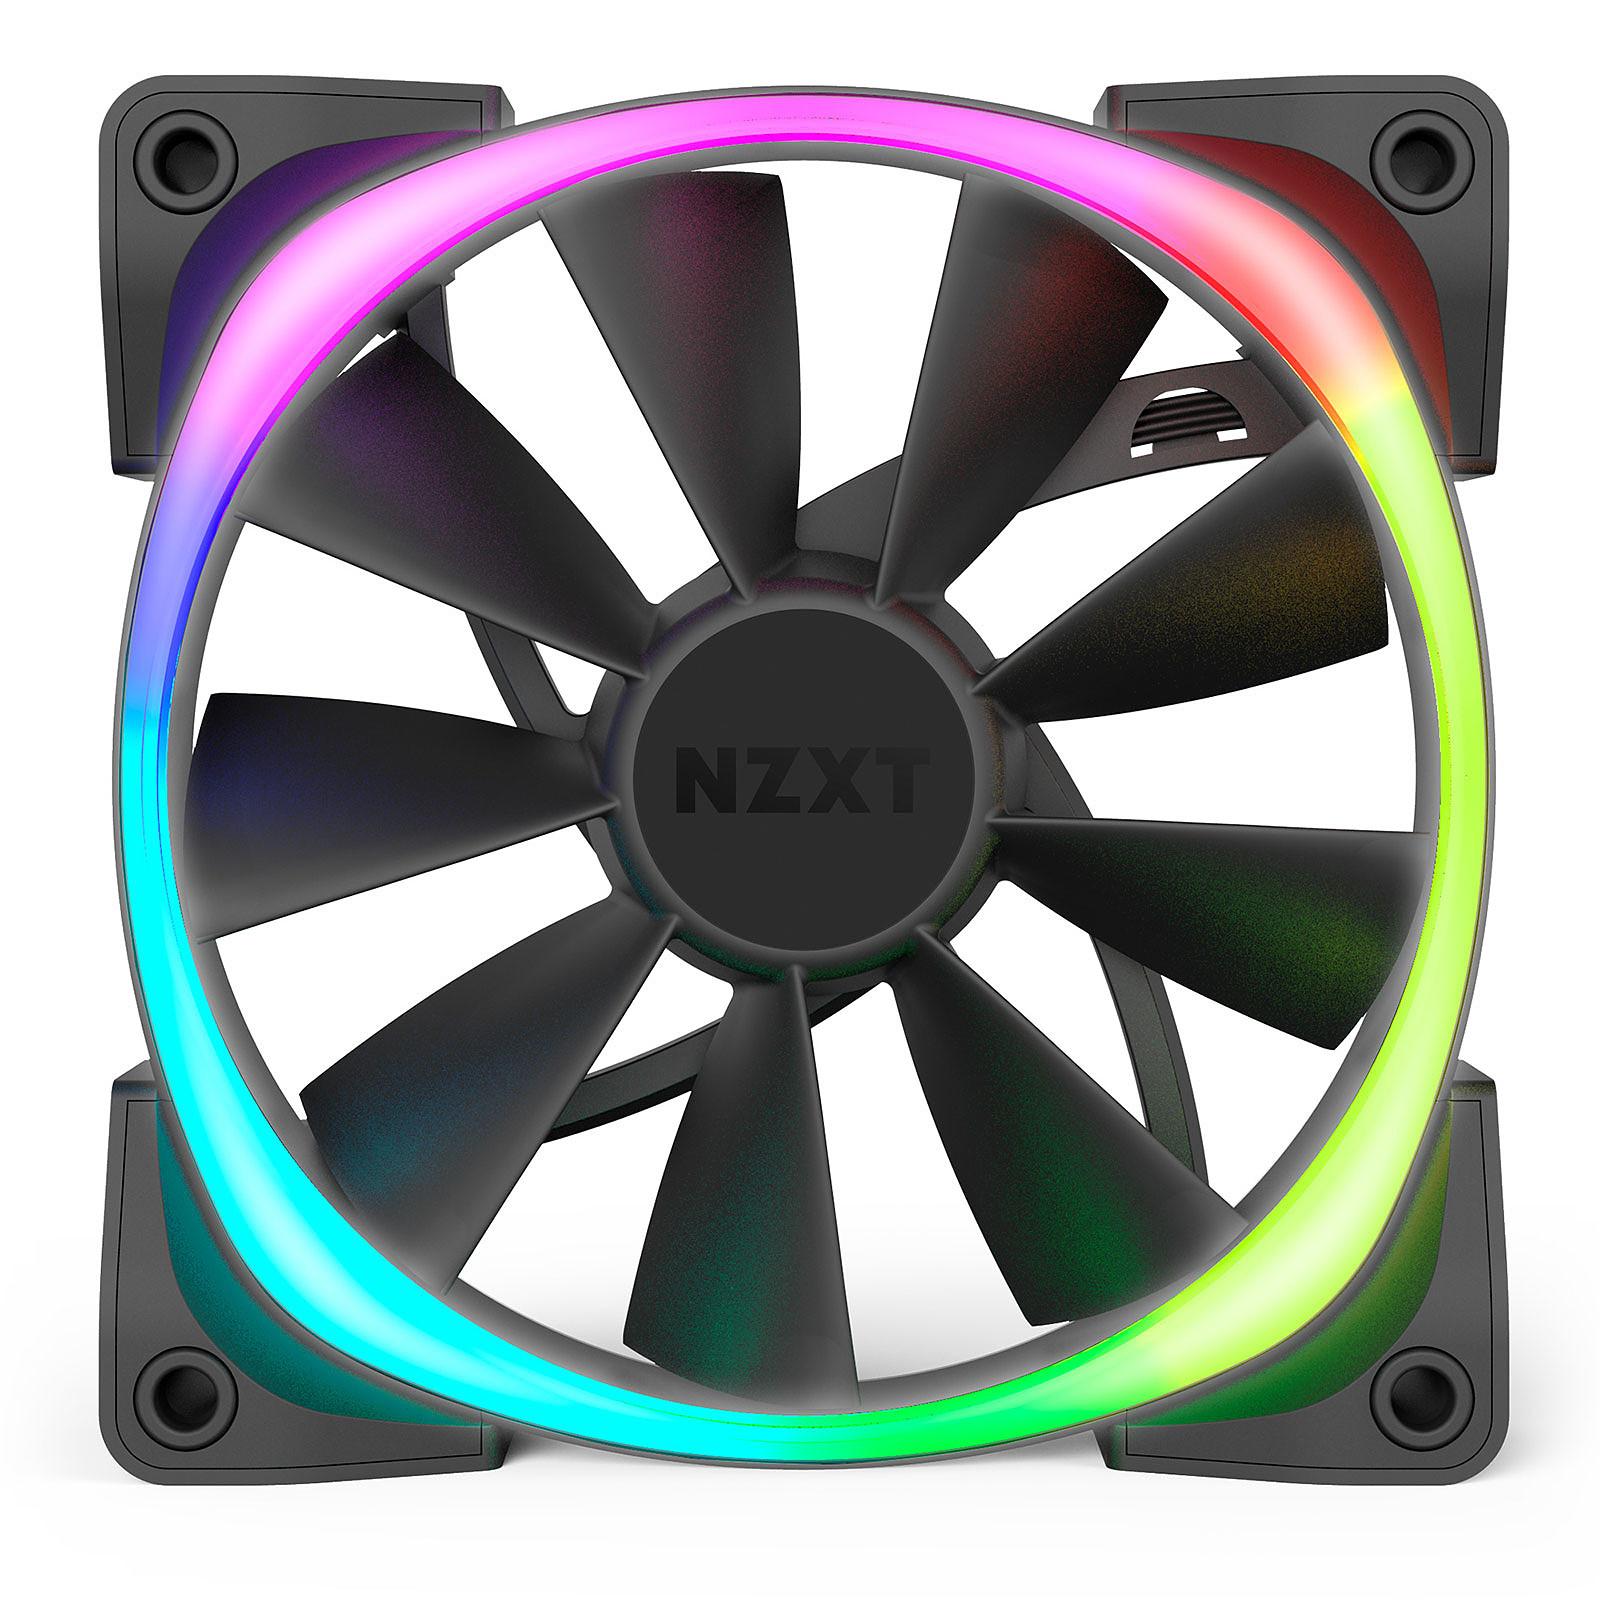 NZXT Aer RGB 2 120 mm